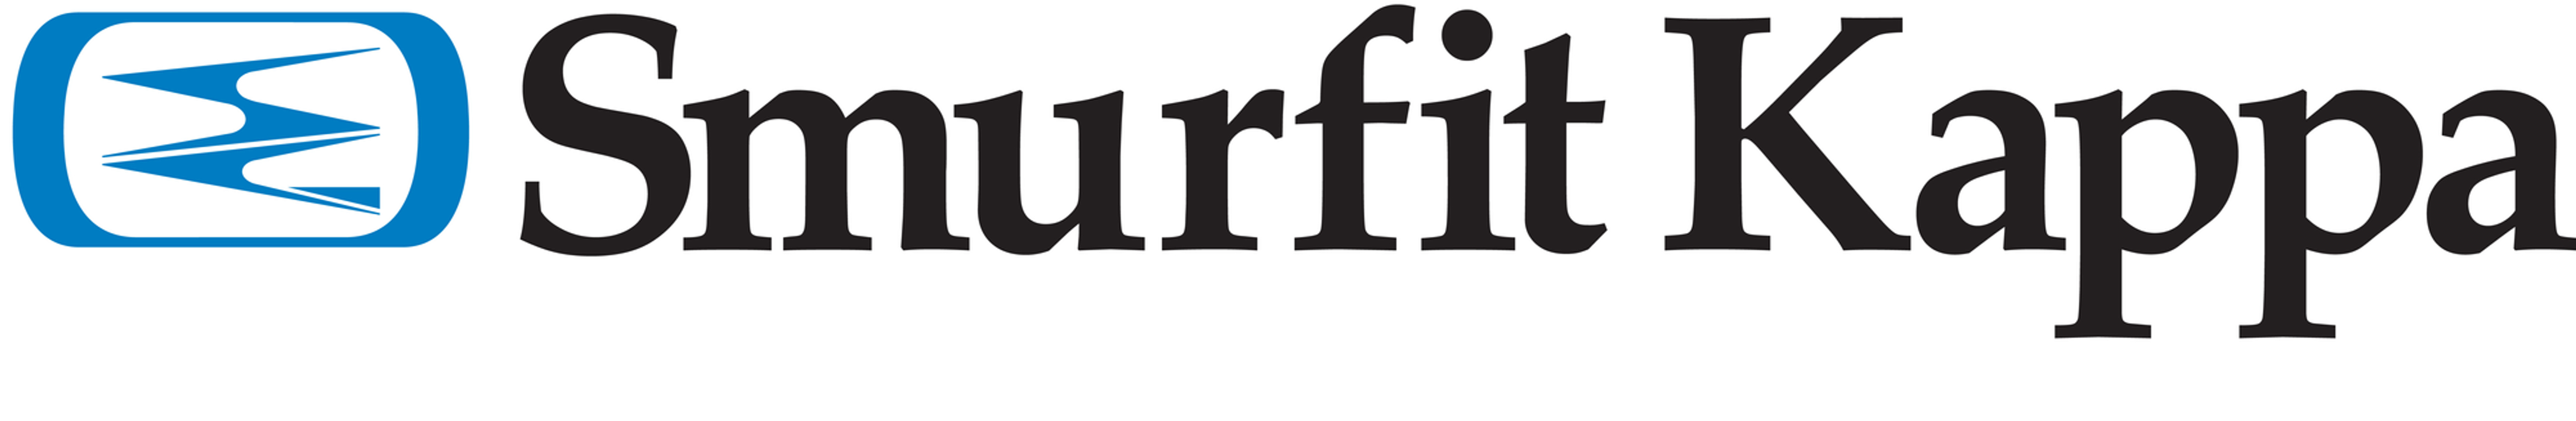 Smurfit-Kappa.jpg